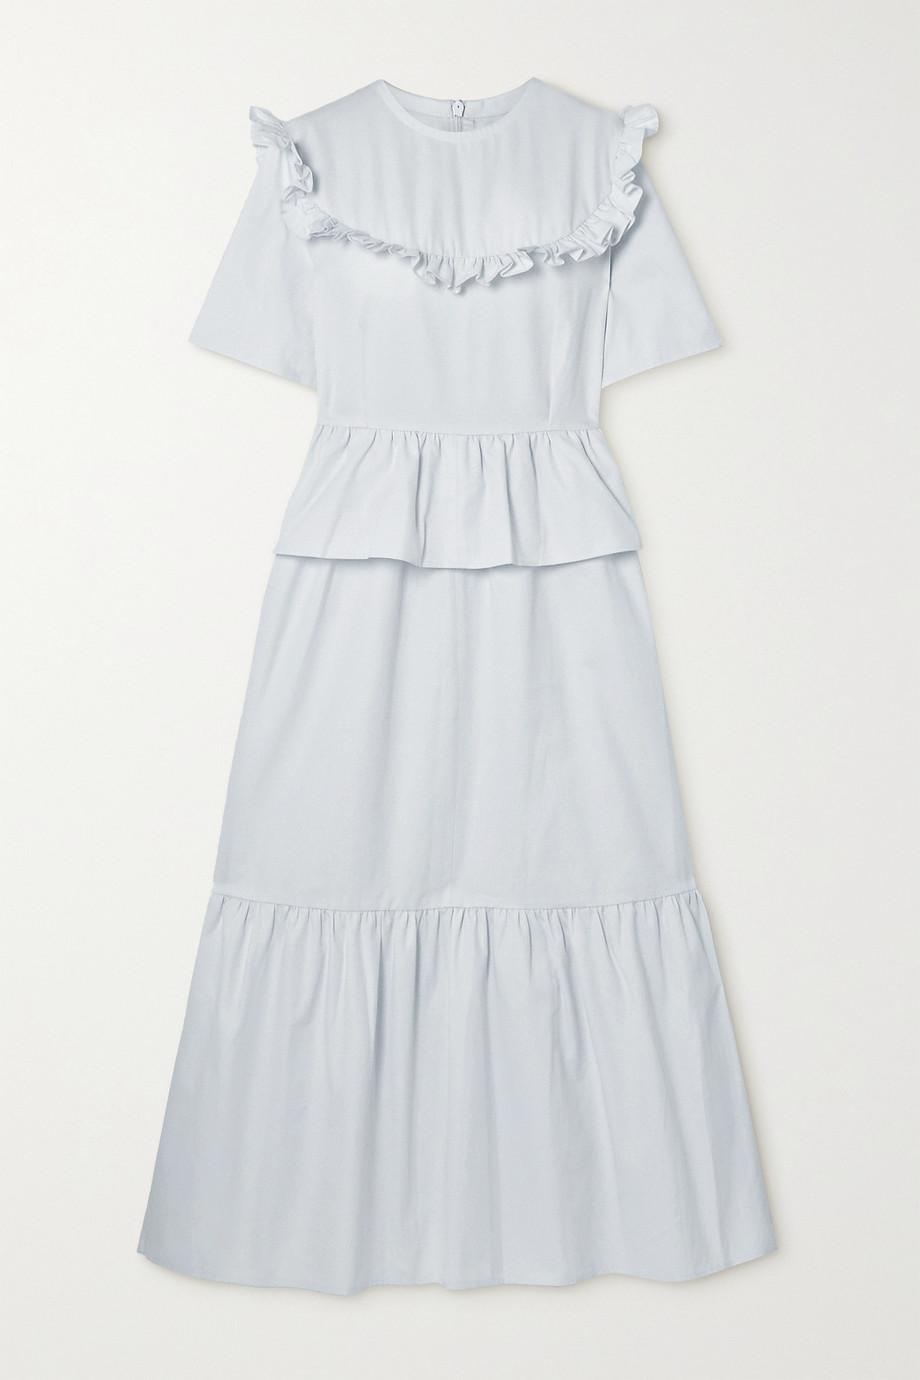 Àcheval Pampa + NET SUSTAIN Victoria tiered ruffled stretch-cotton twill dress